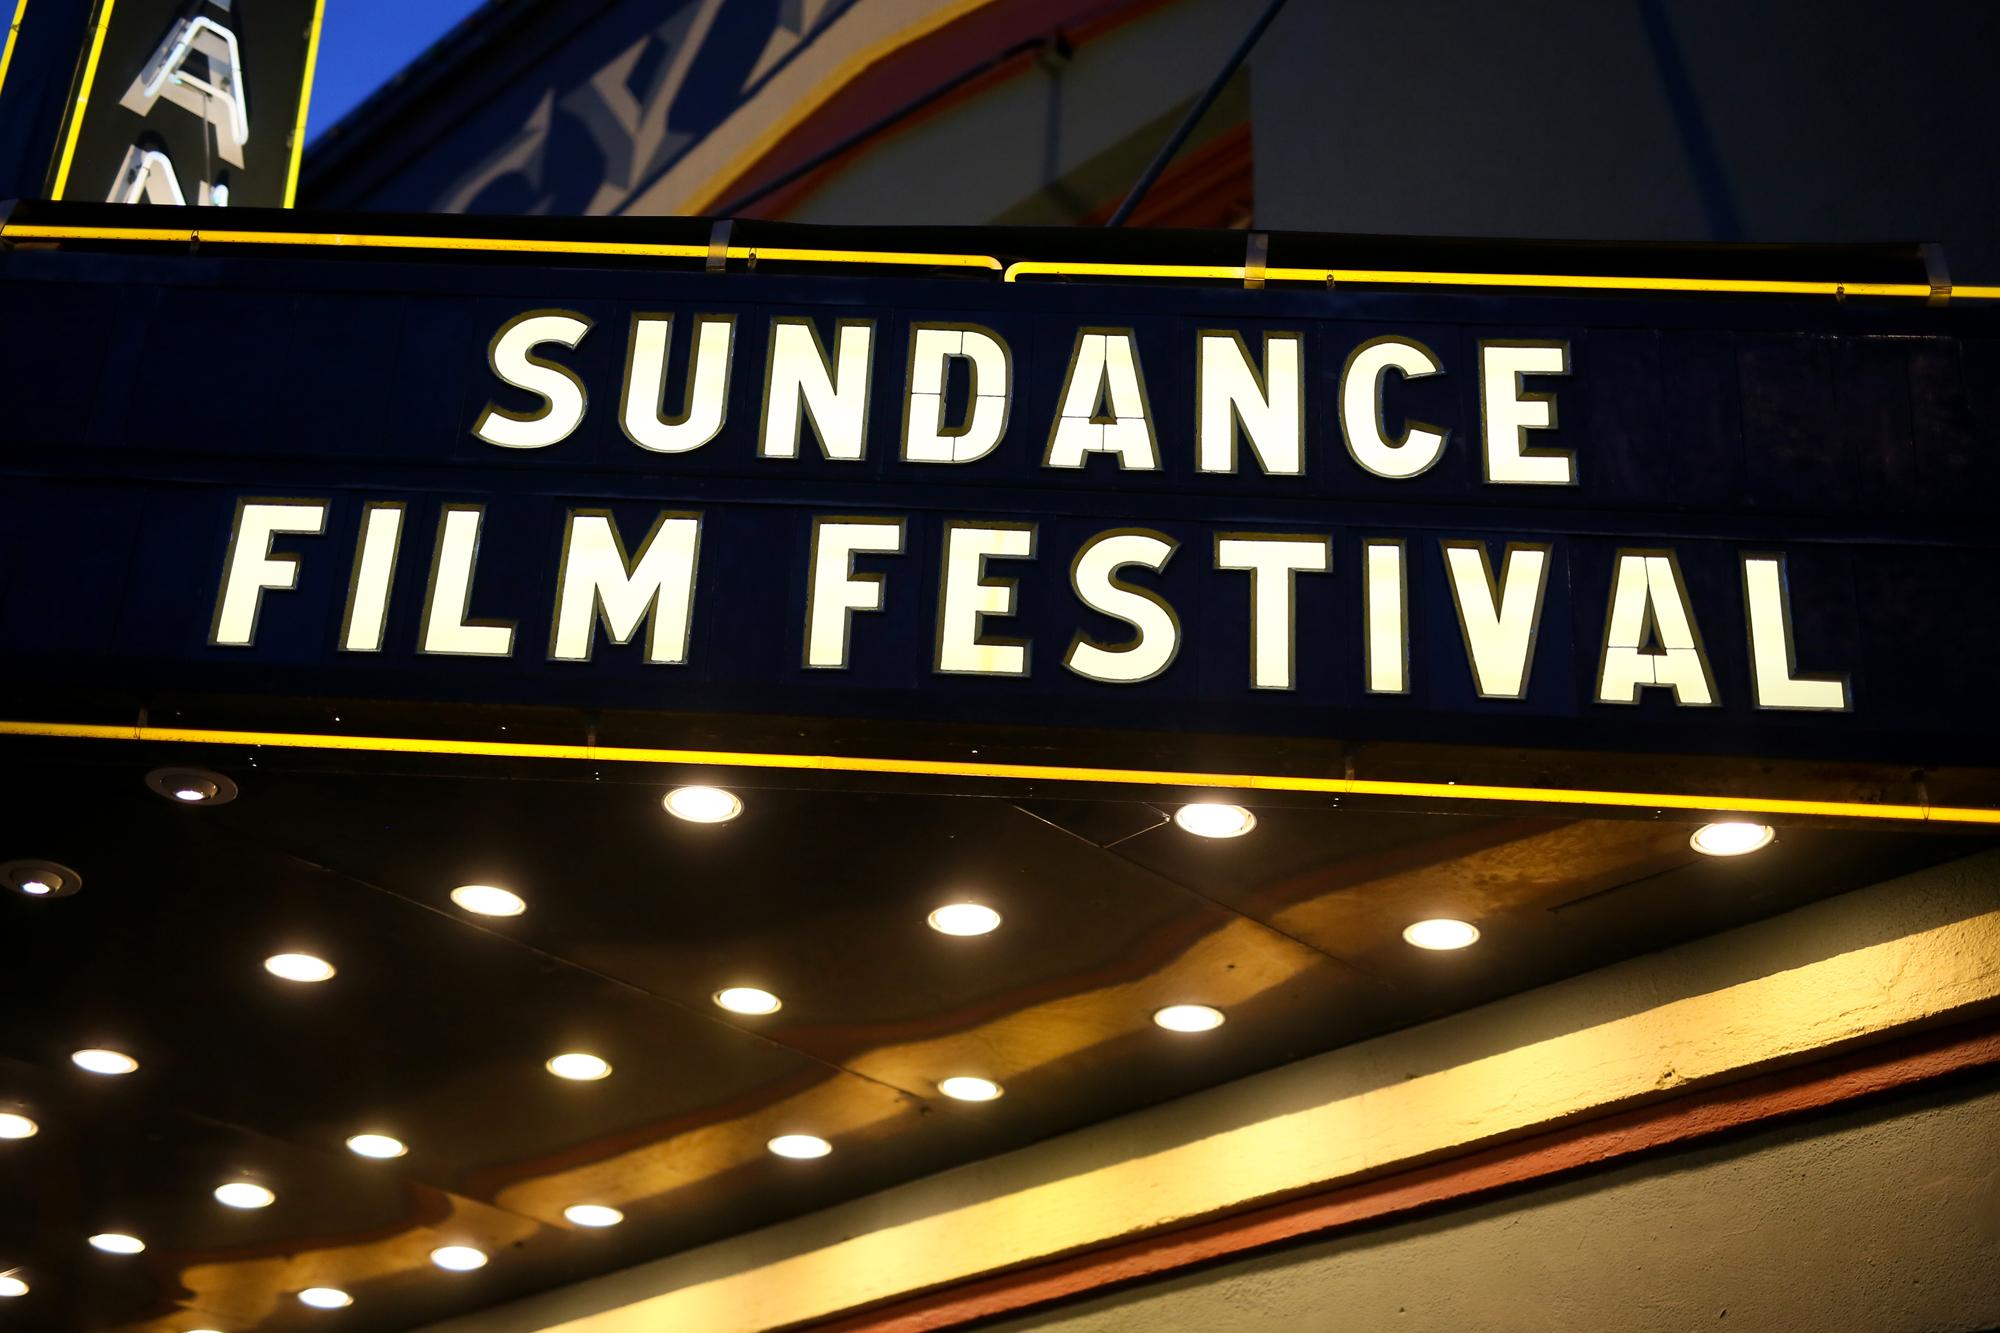 Sundance Film Festival Presents: Satellite Screens